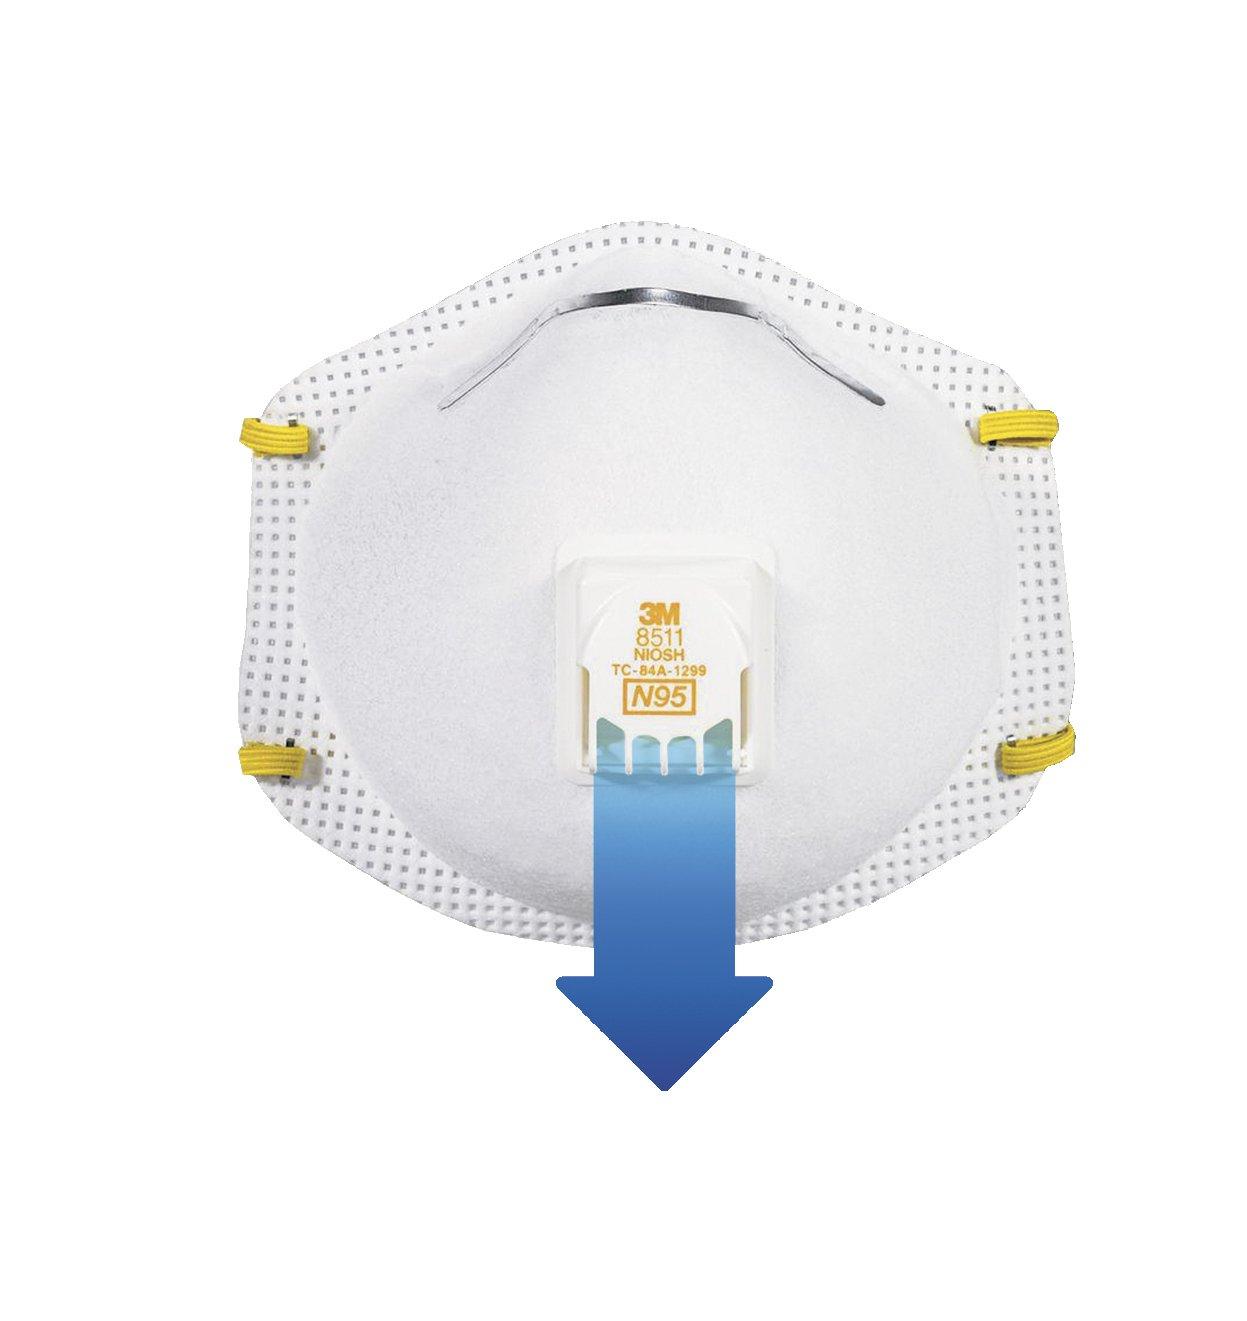 3M Valved Respirator 5